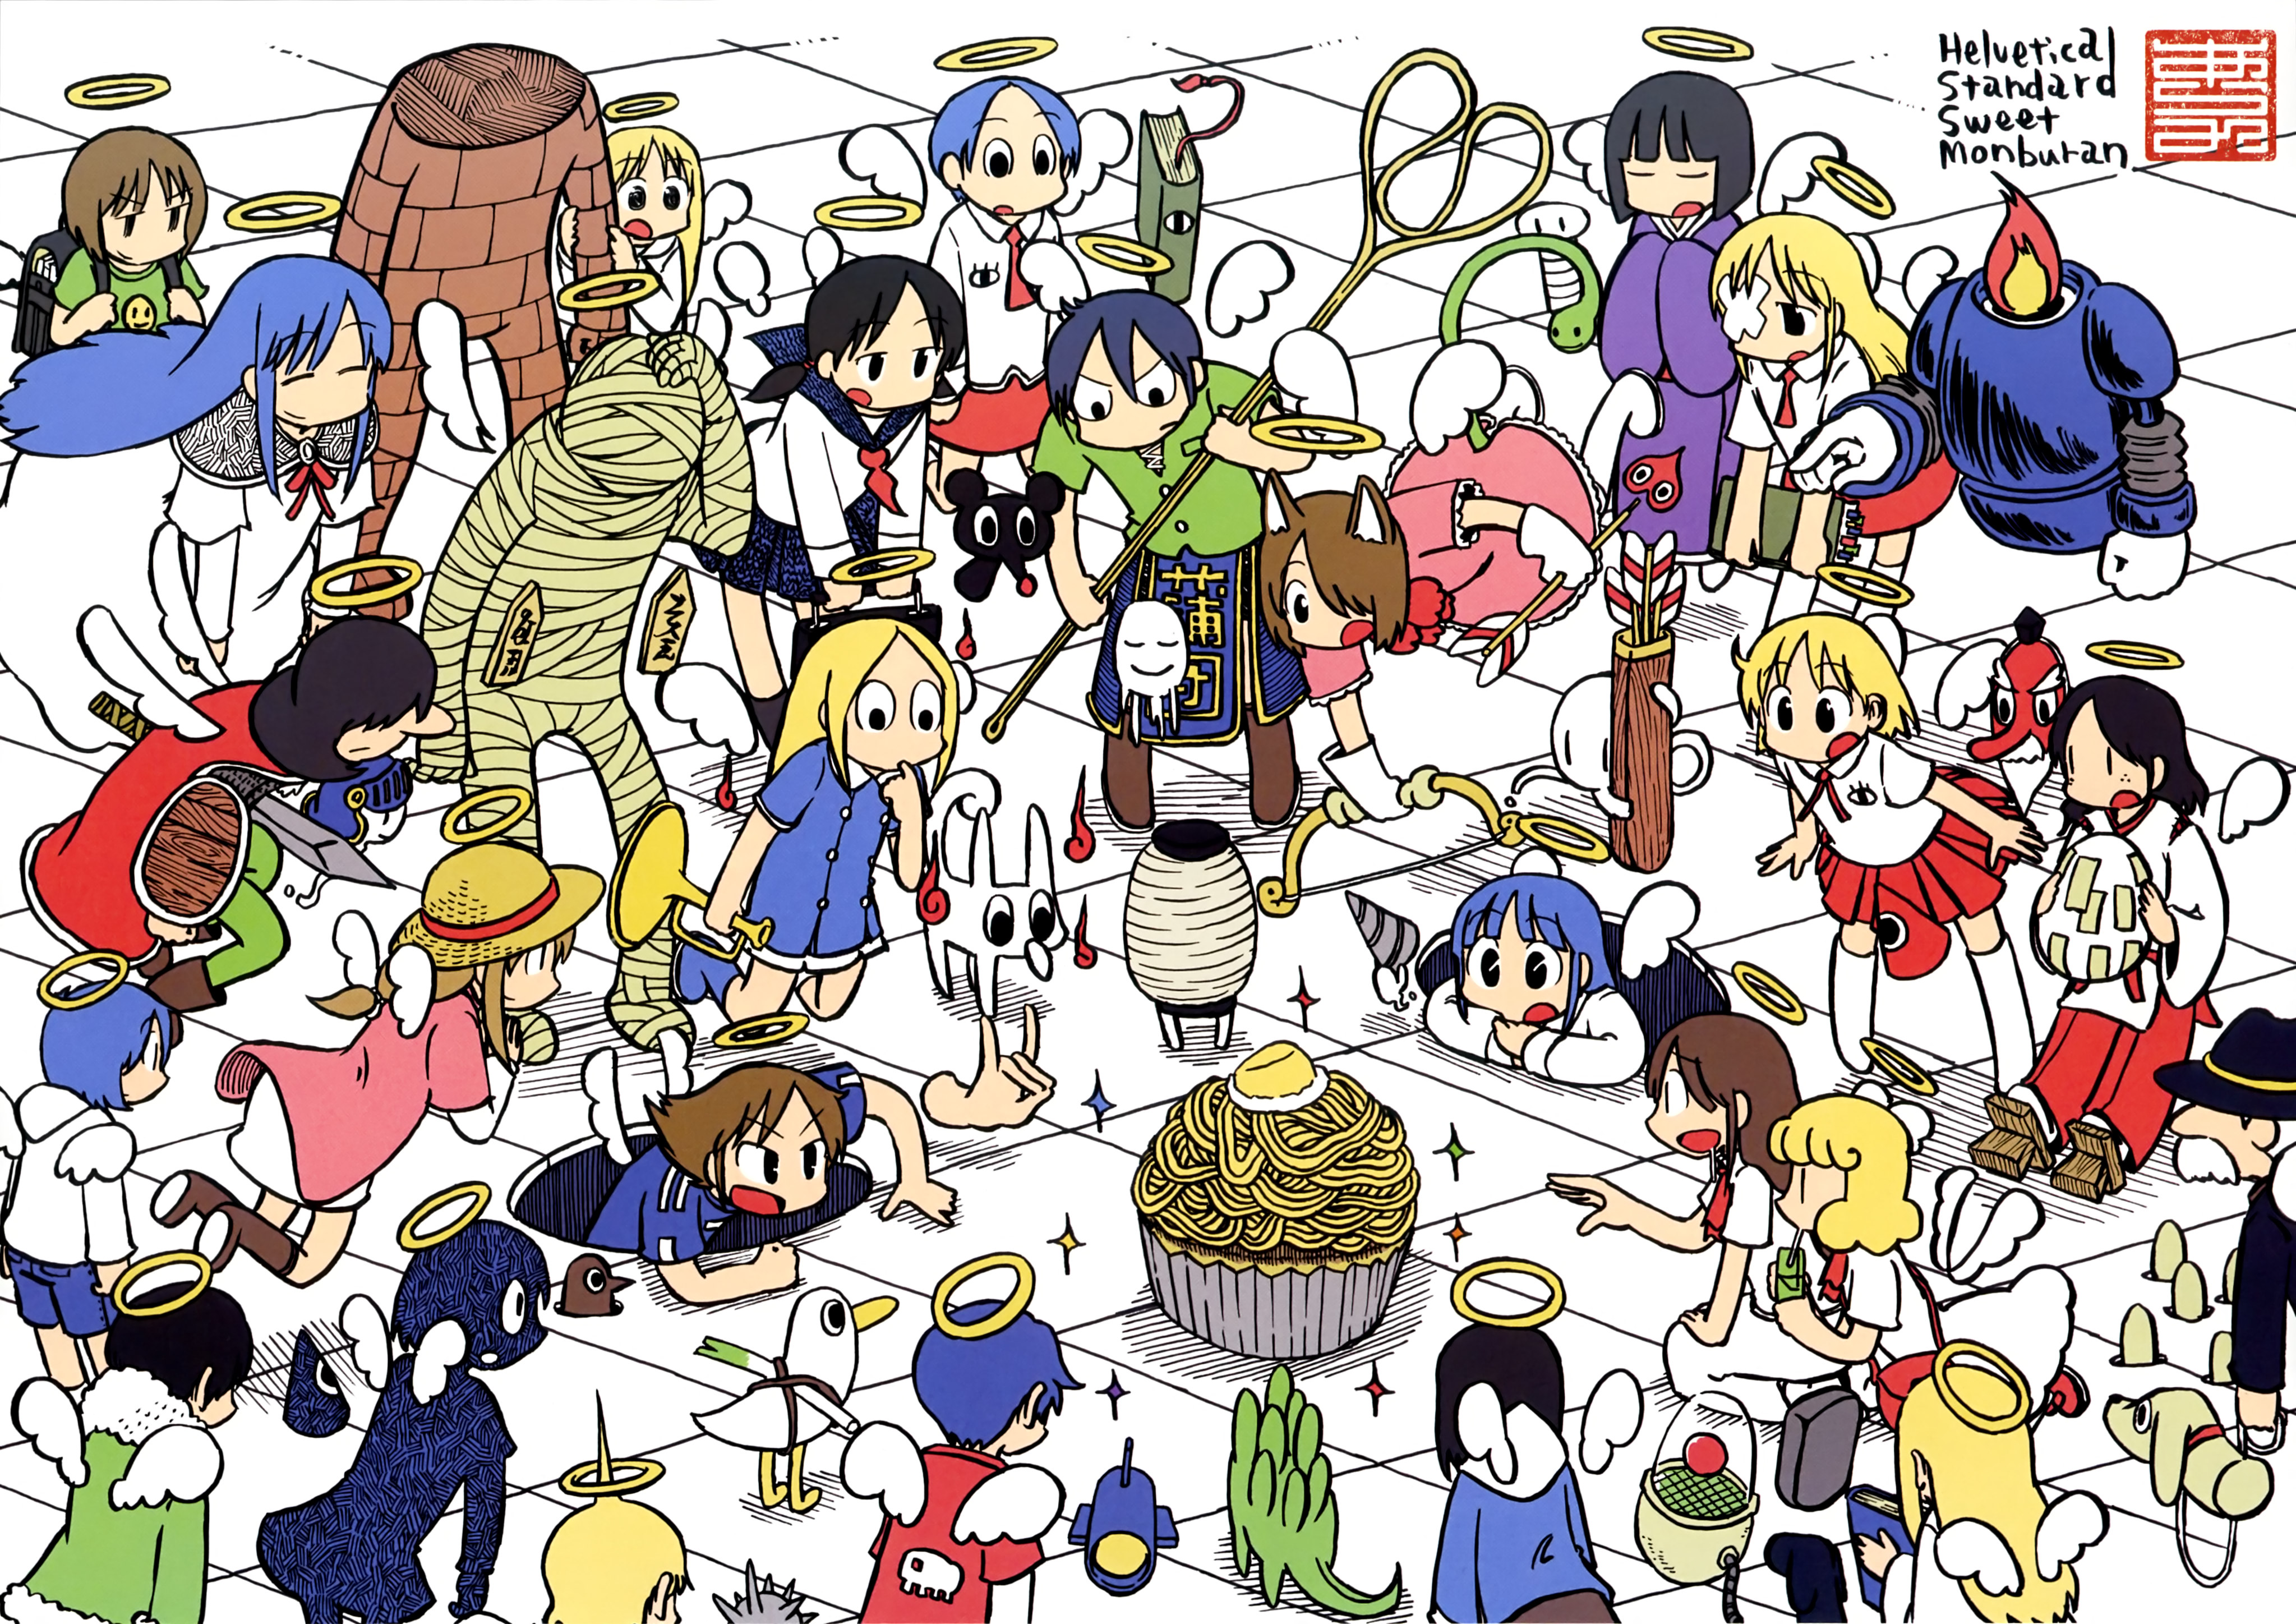 Newtype 30th Anniversary CREATOR'S CALENDAR 2015-2016 arawi keeichi